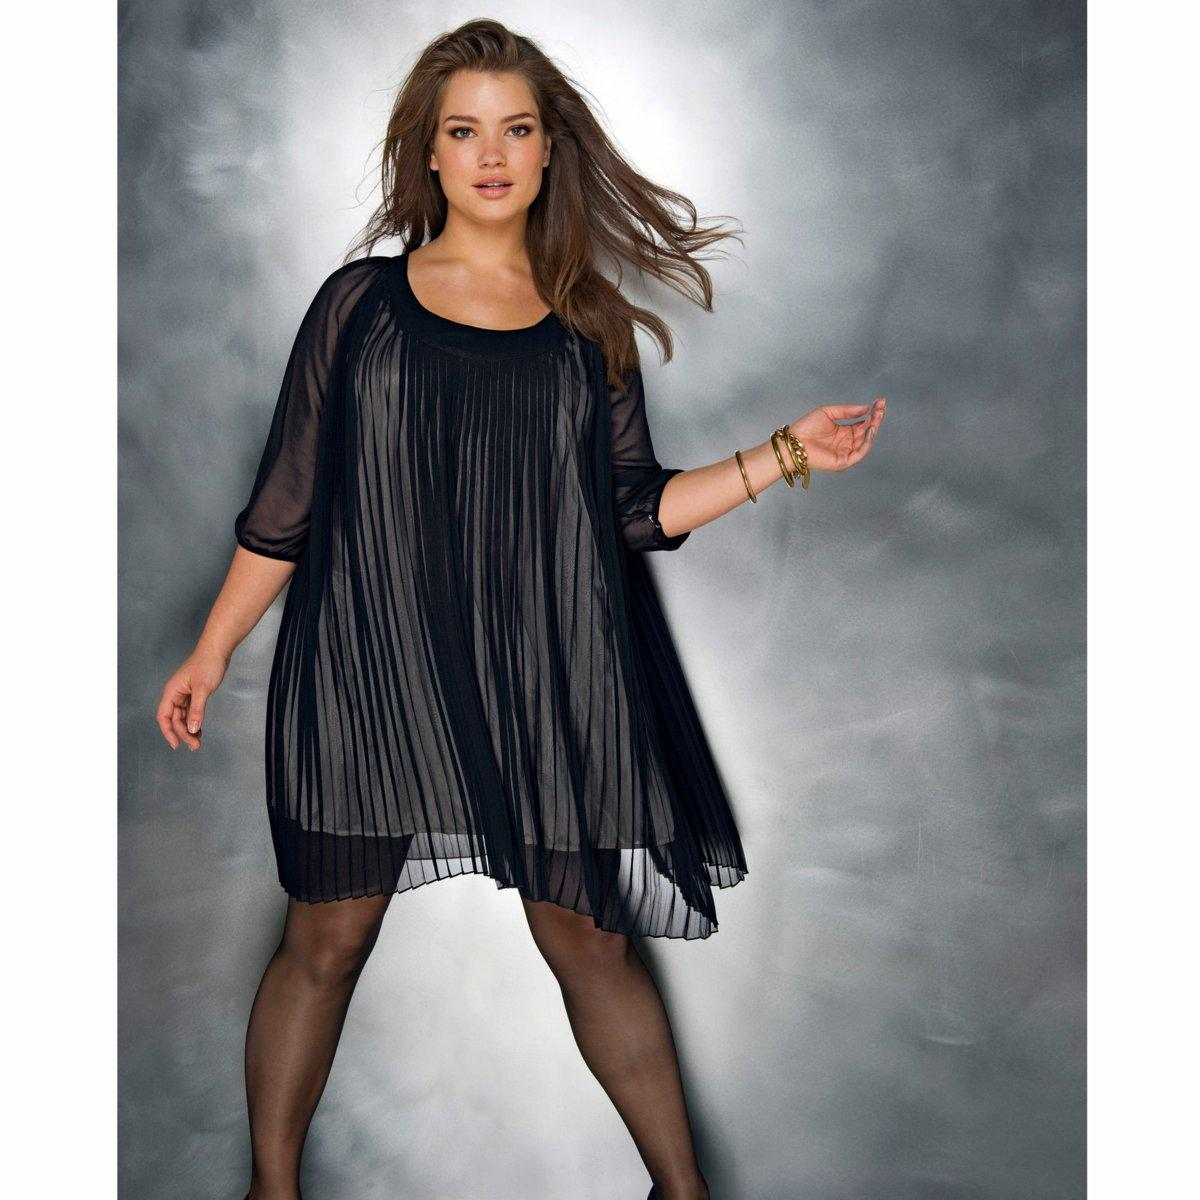 e58b1627660b Βραδυνα Φορεματα Μεγαλα Μεγεθη Φθινόπωρο 2011 κωδ. 324245144